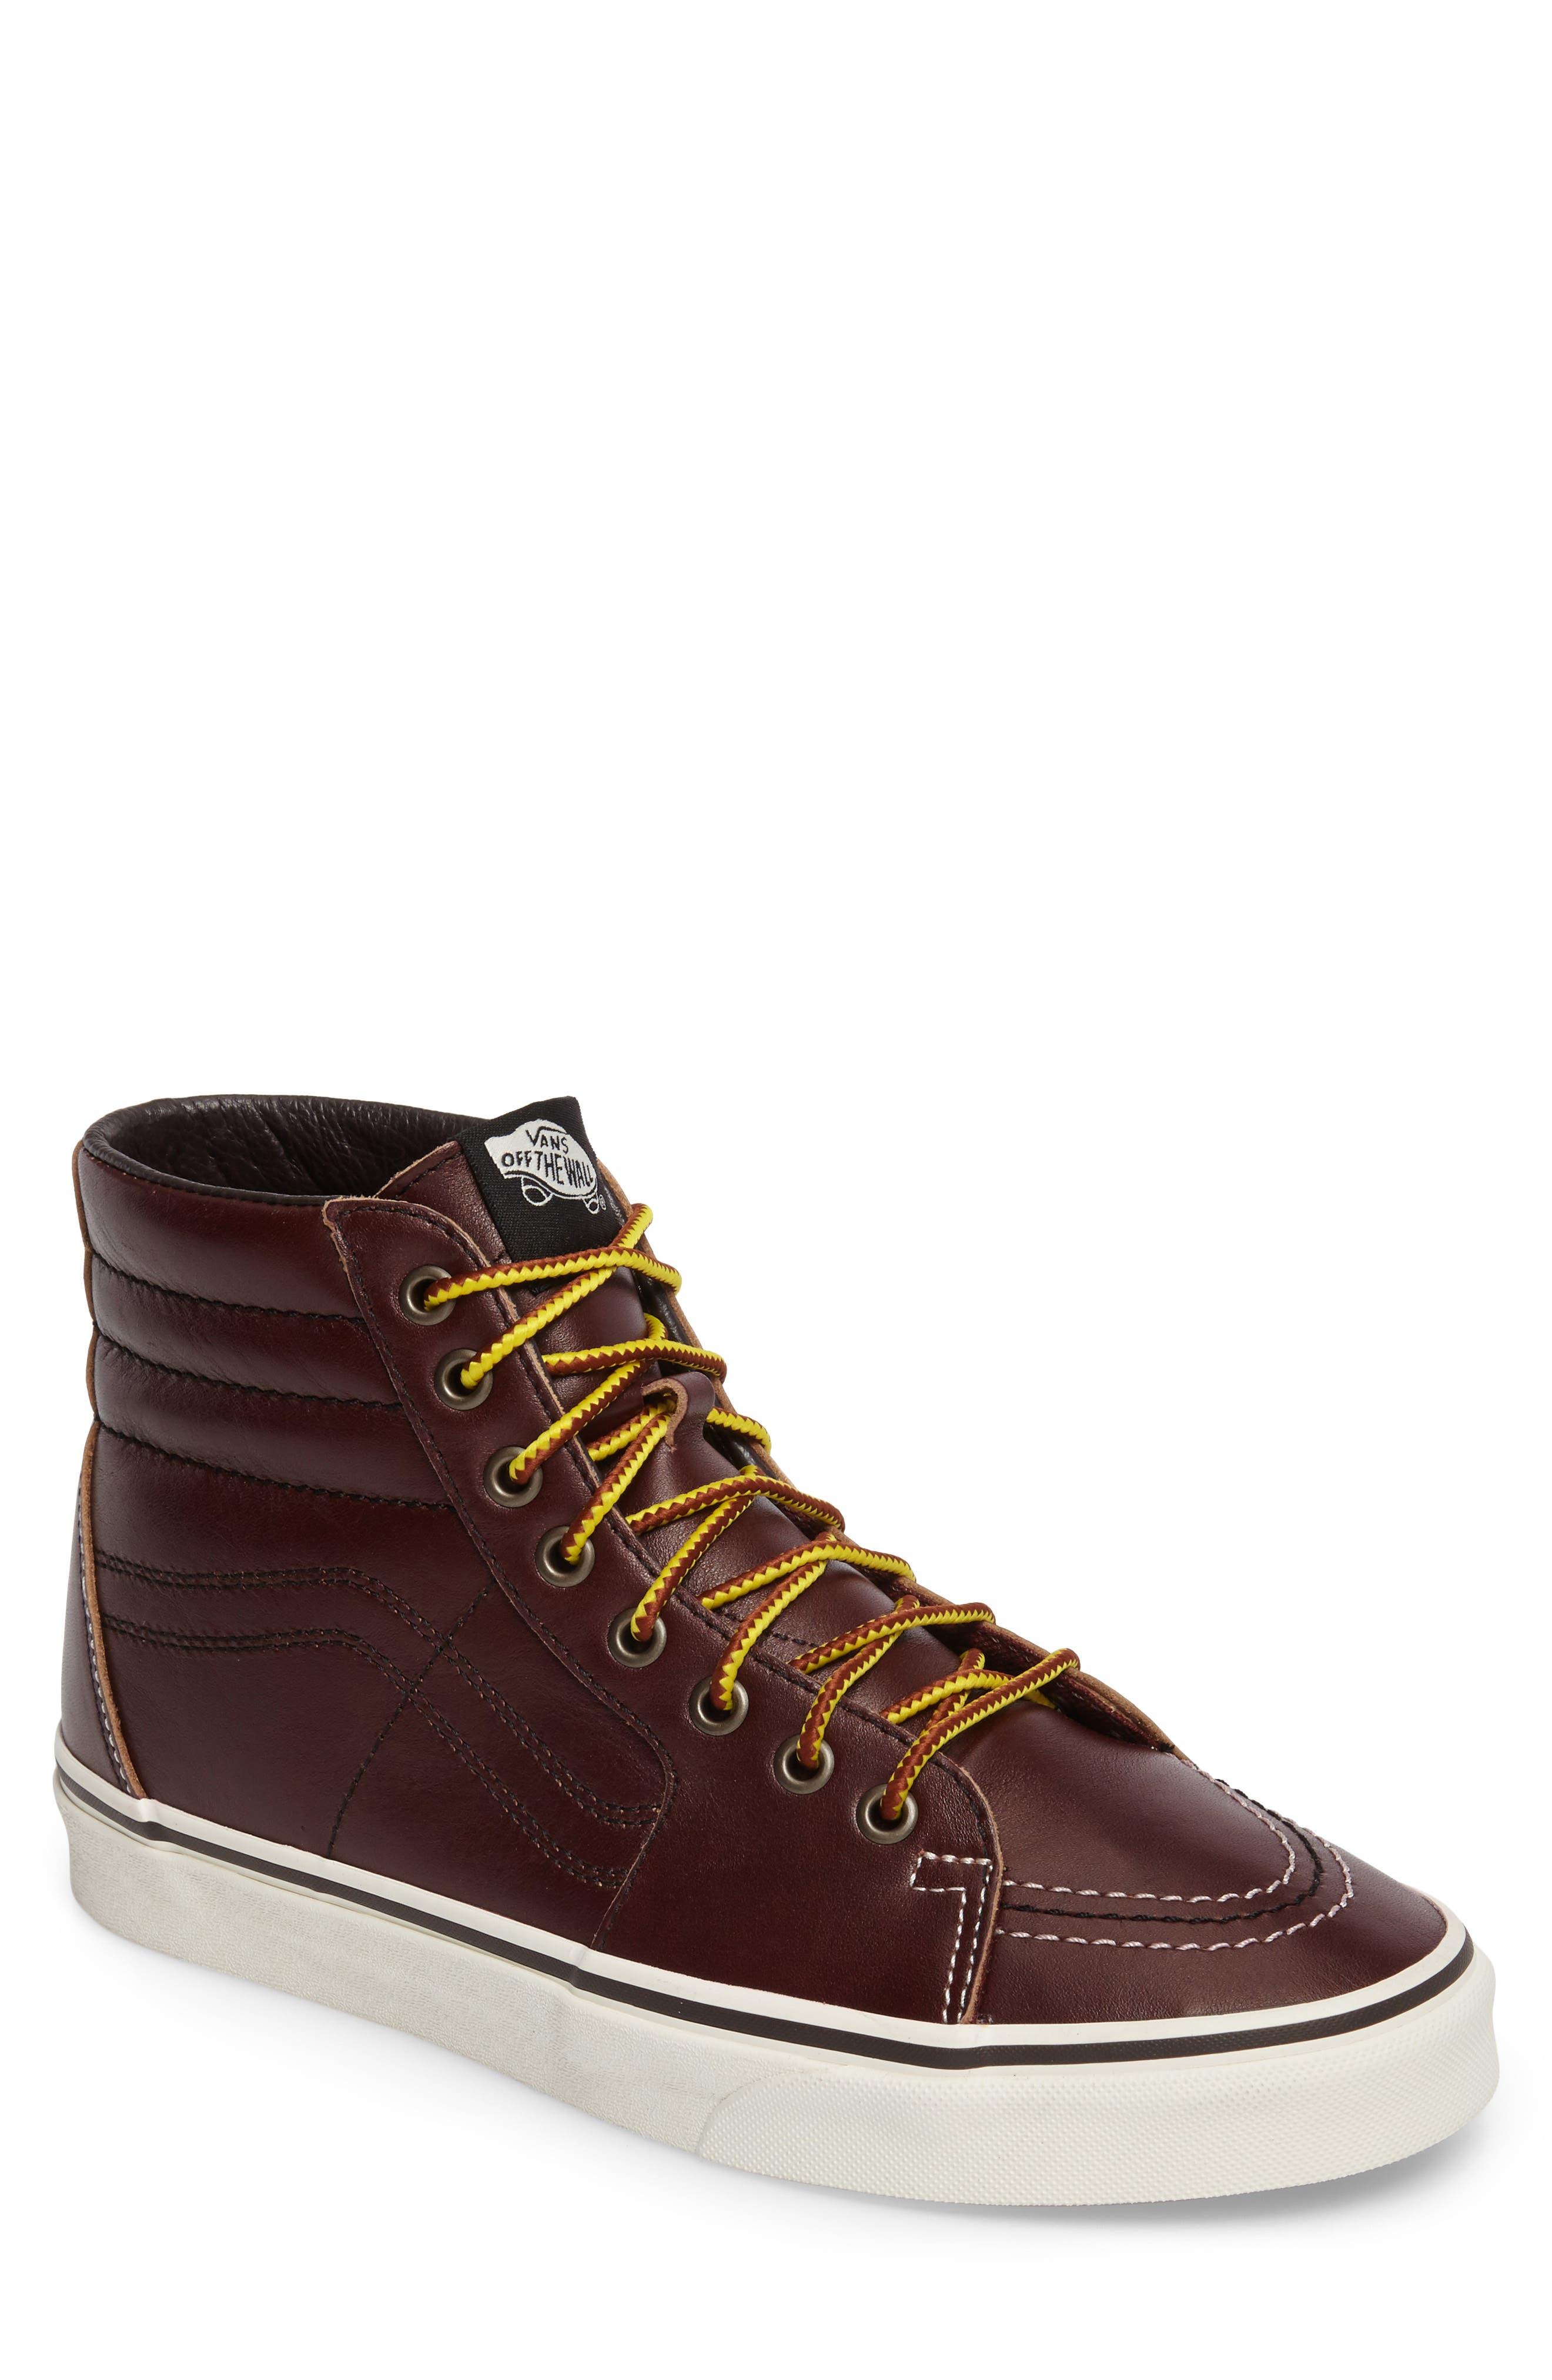 Sk8-Hi Sneaker,                             Main thumbnail 1, color,                             Rum Raisin/Marshmallow Leather